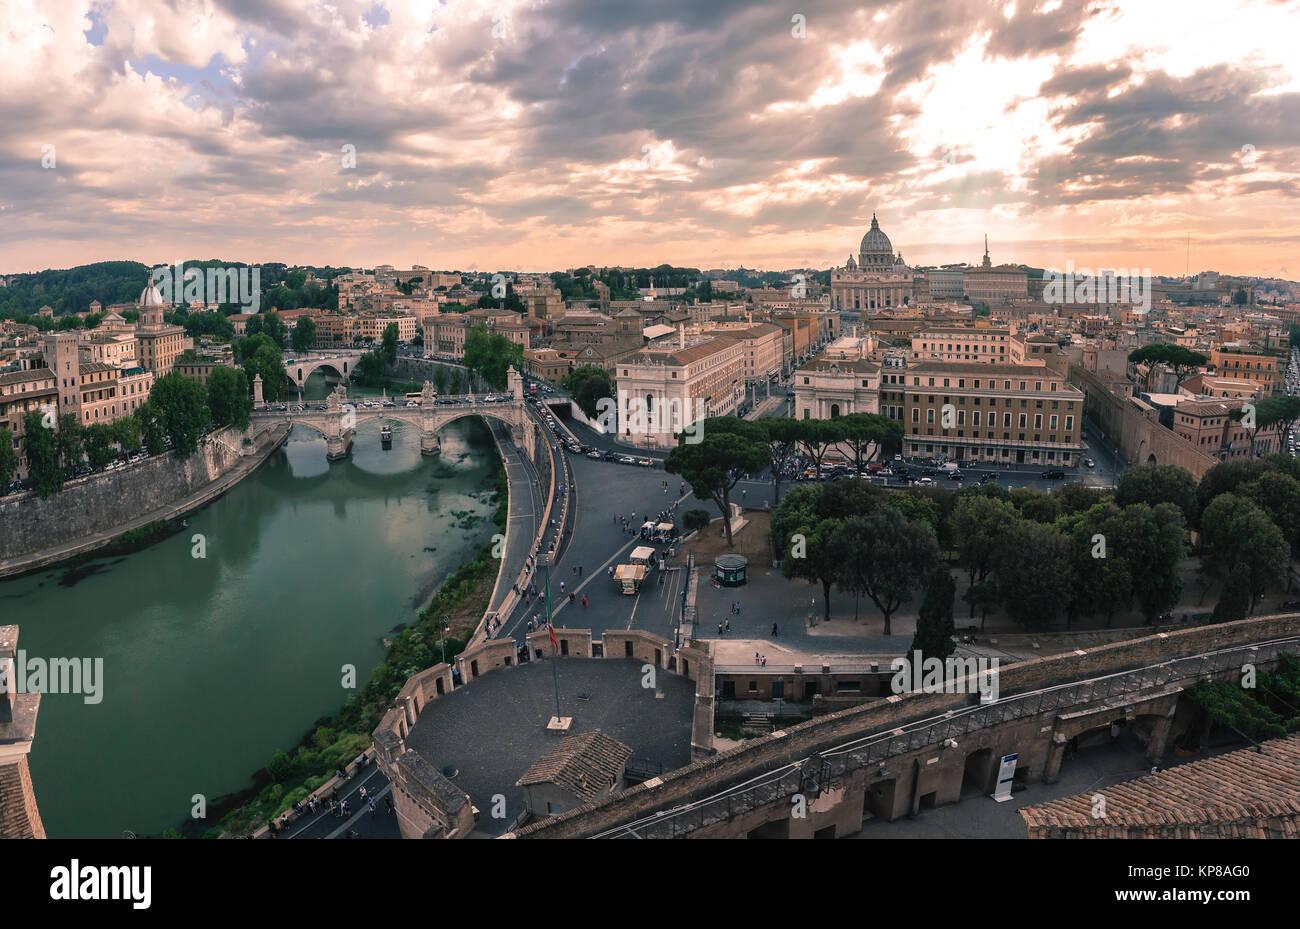 Wunderbare Luftaufnahme von Rom bei Sonnenuntergang, Italien Stockbild